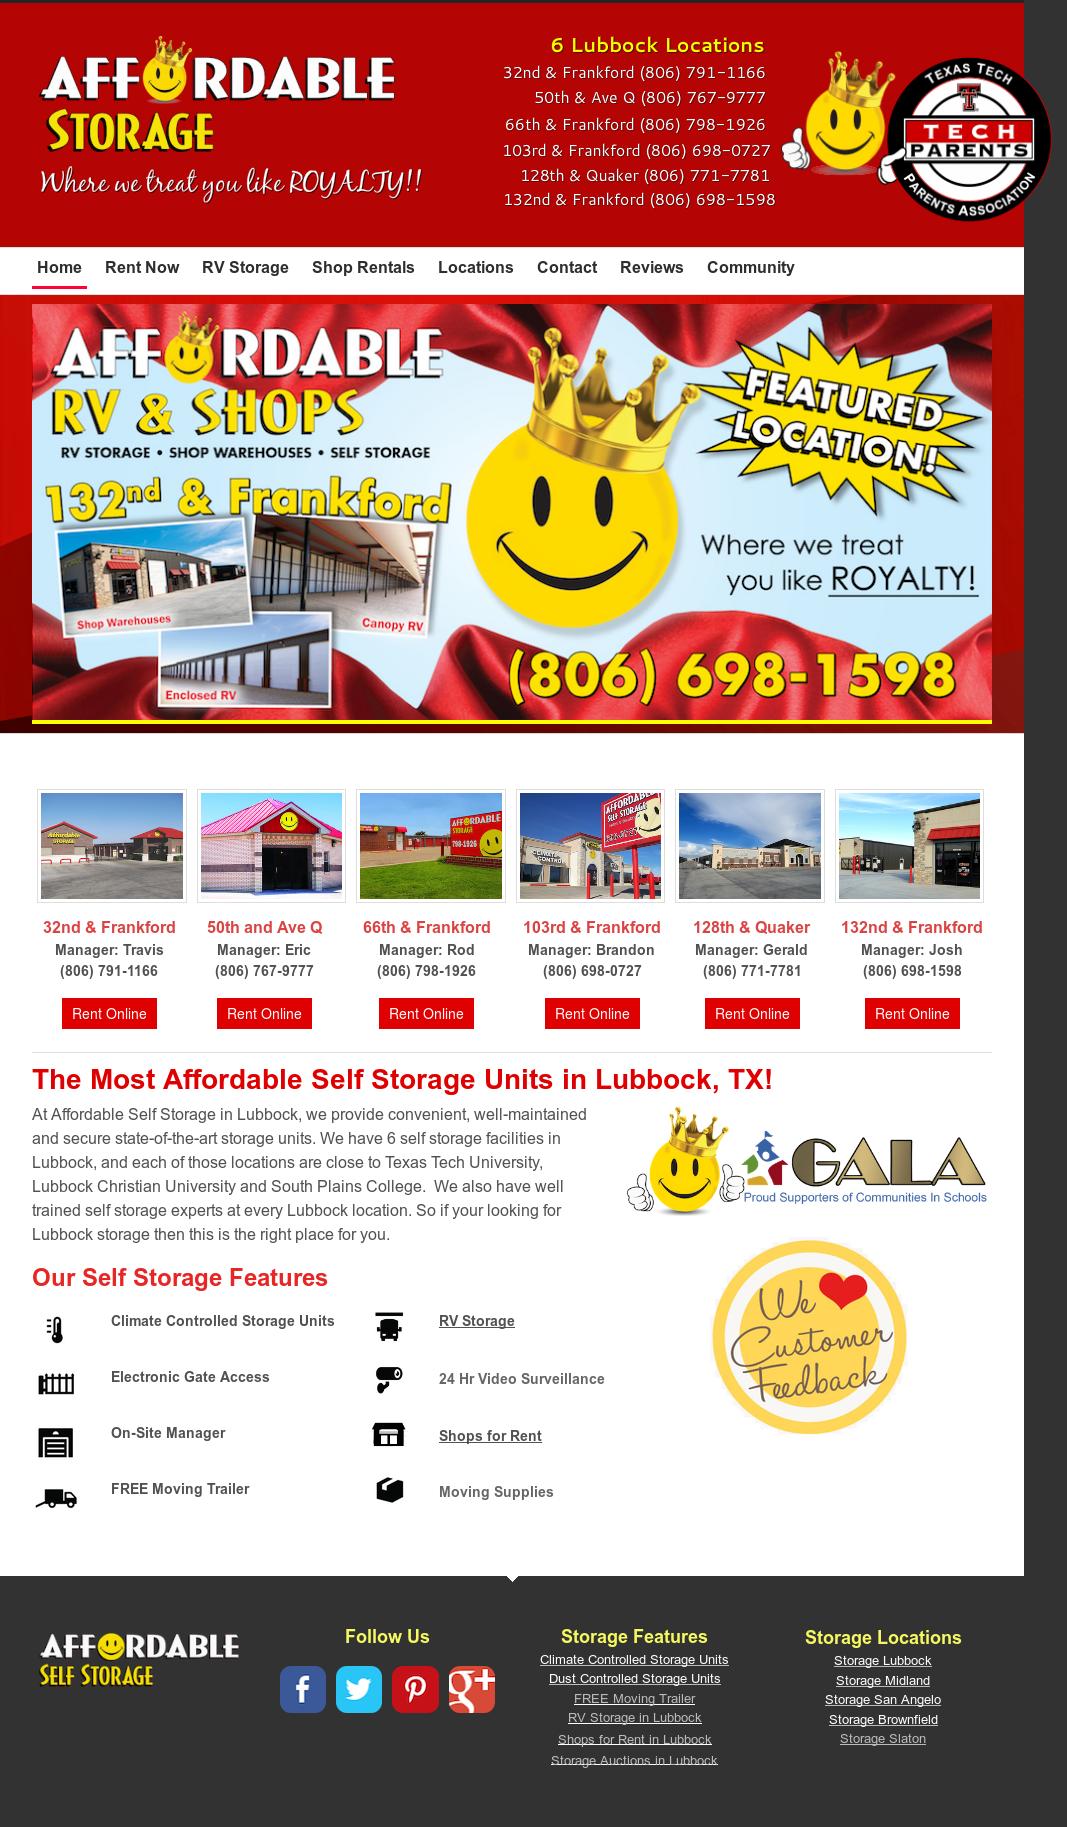 Affordable Self Storage Lubbocku0027s Website Screenshot On Feb 2017